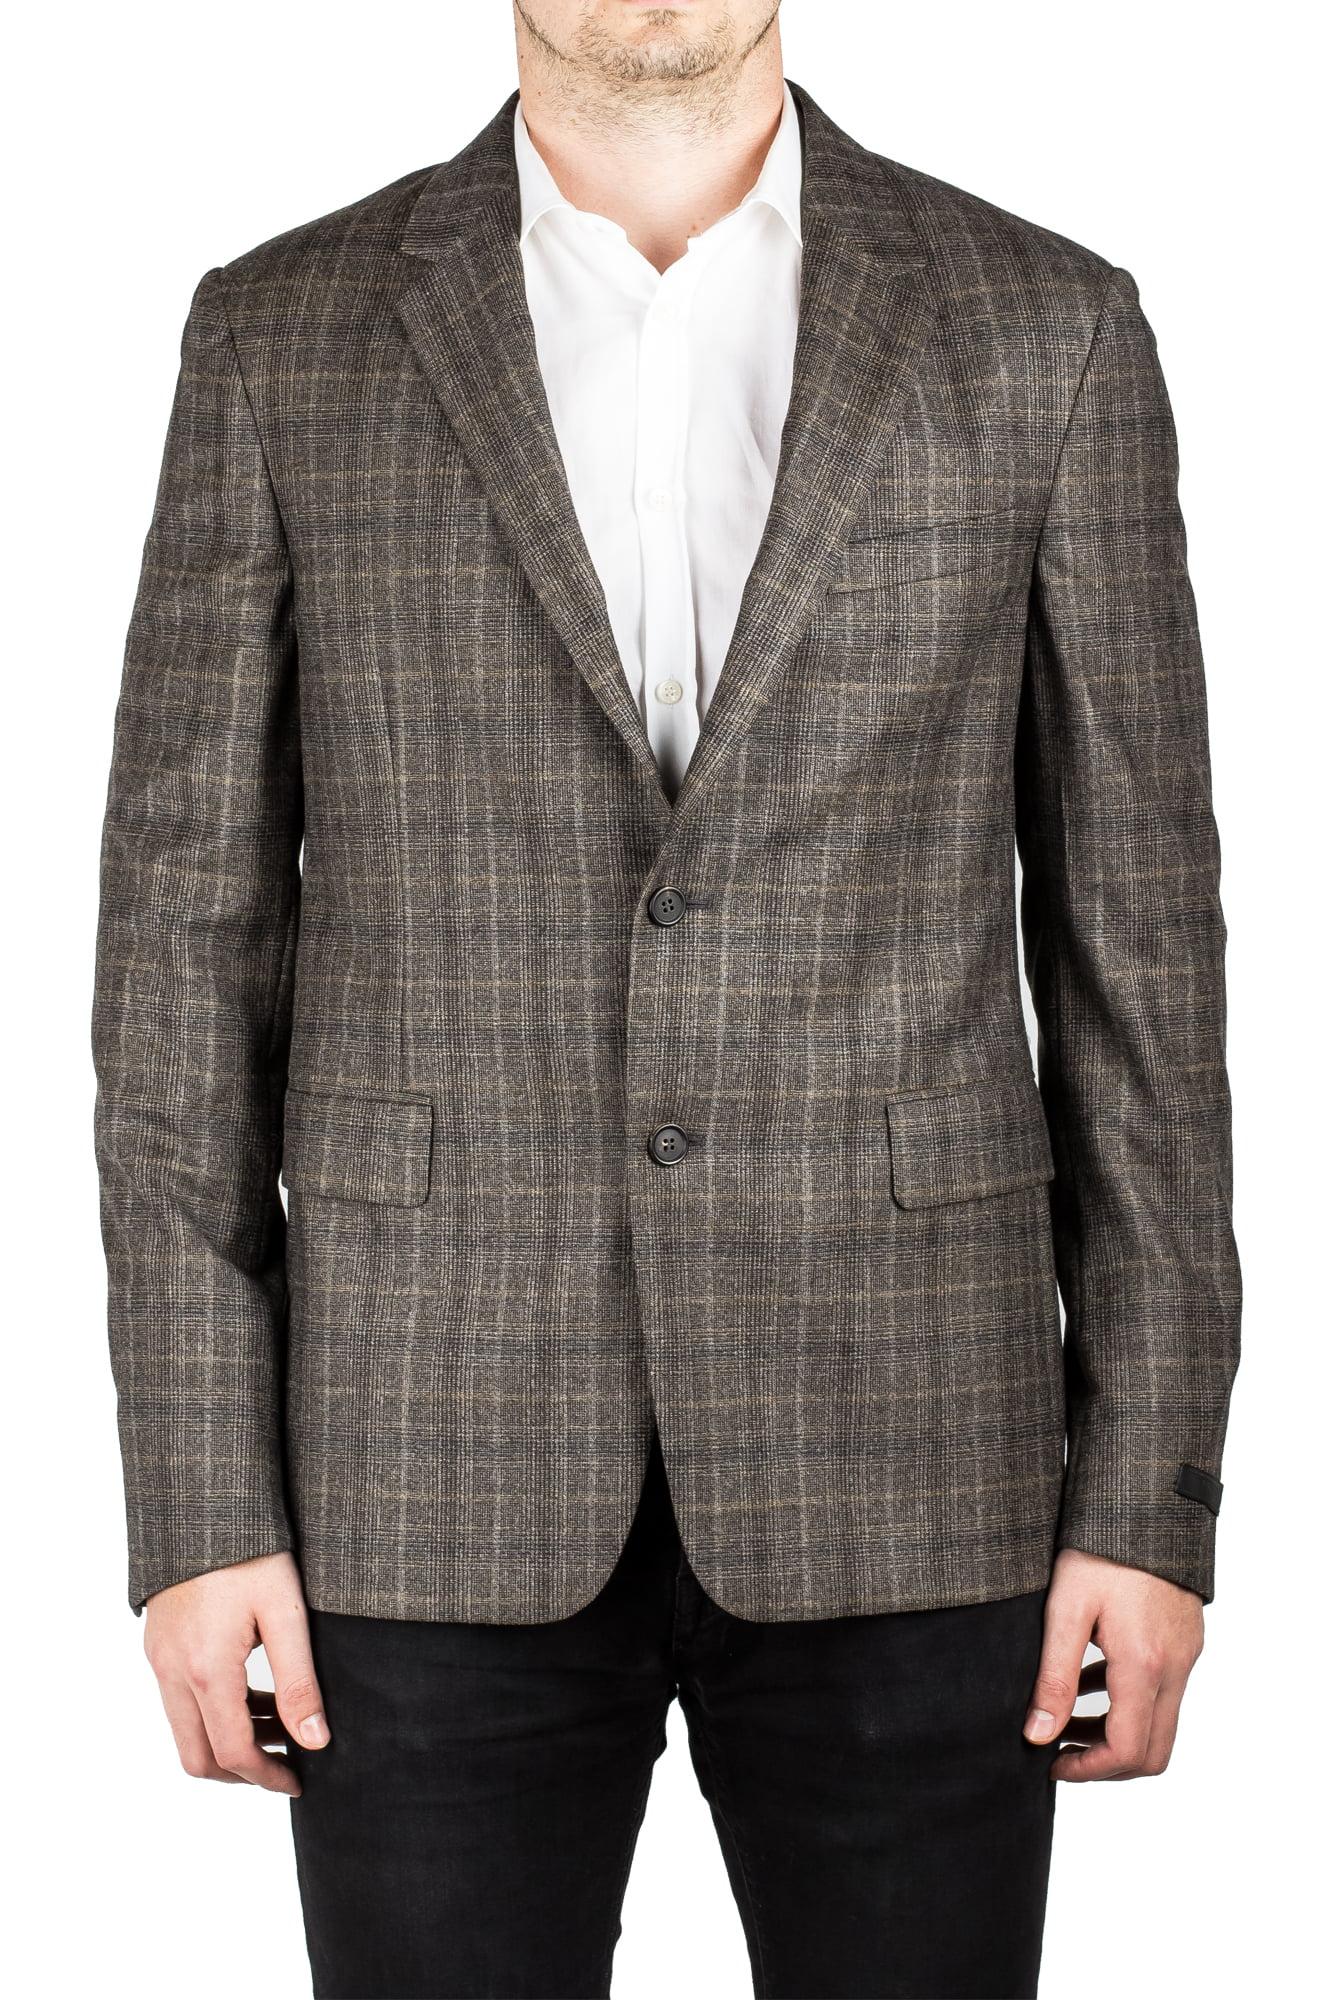 Prada Men's Virgin Wool Notched Lapel Sport Jacket Coat Blazer Plaid Bark Olive by Prada